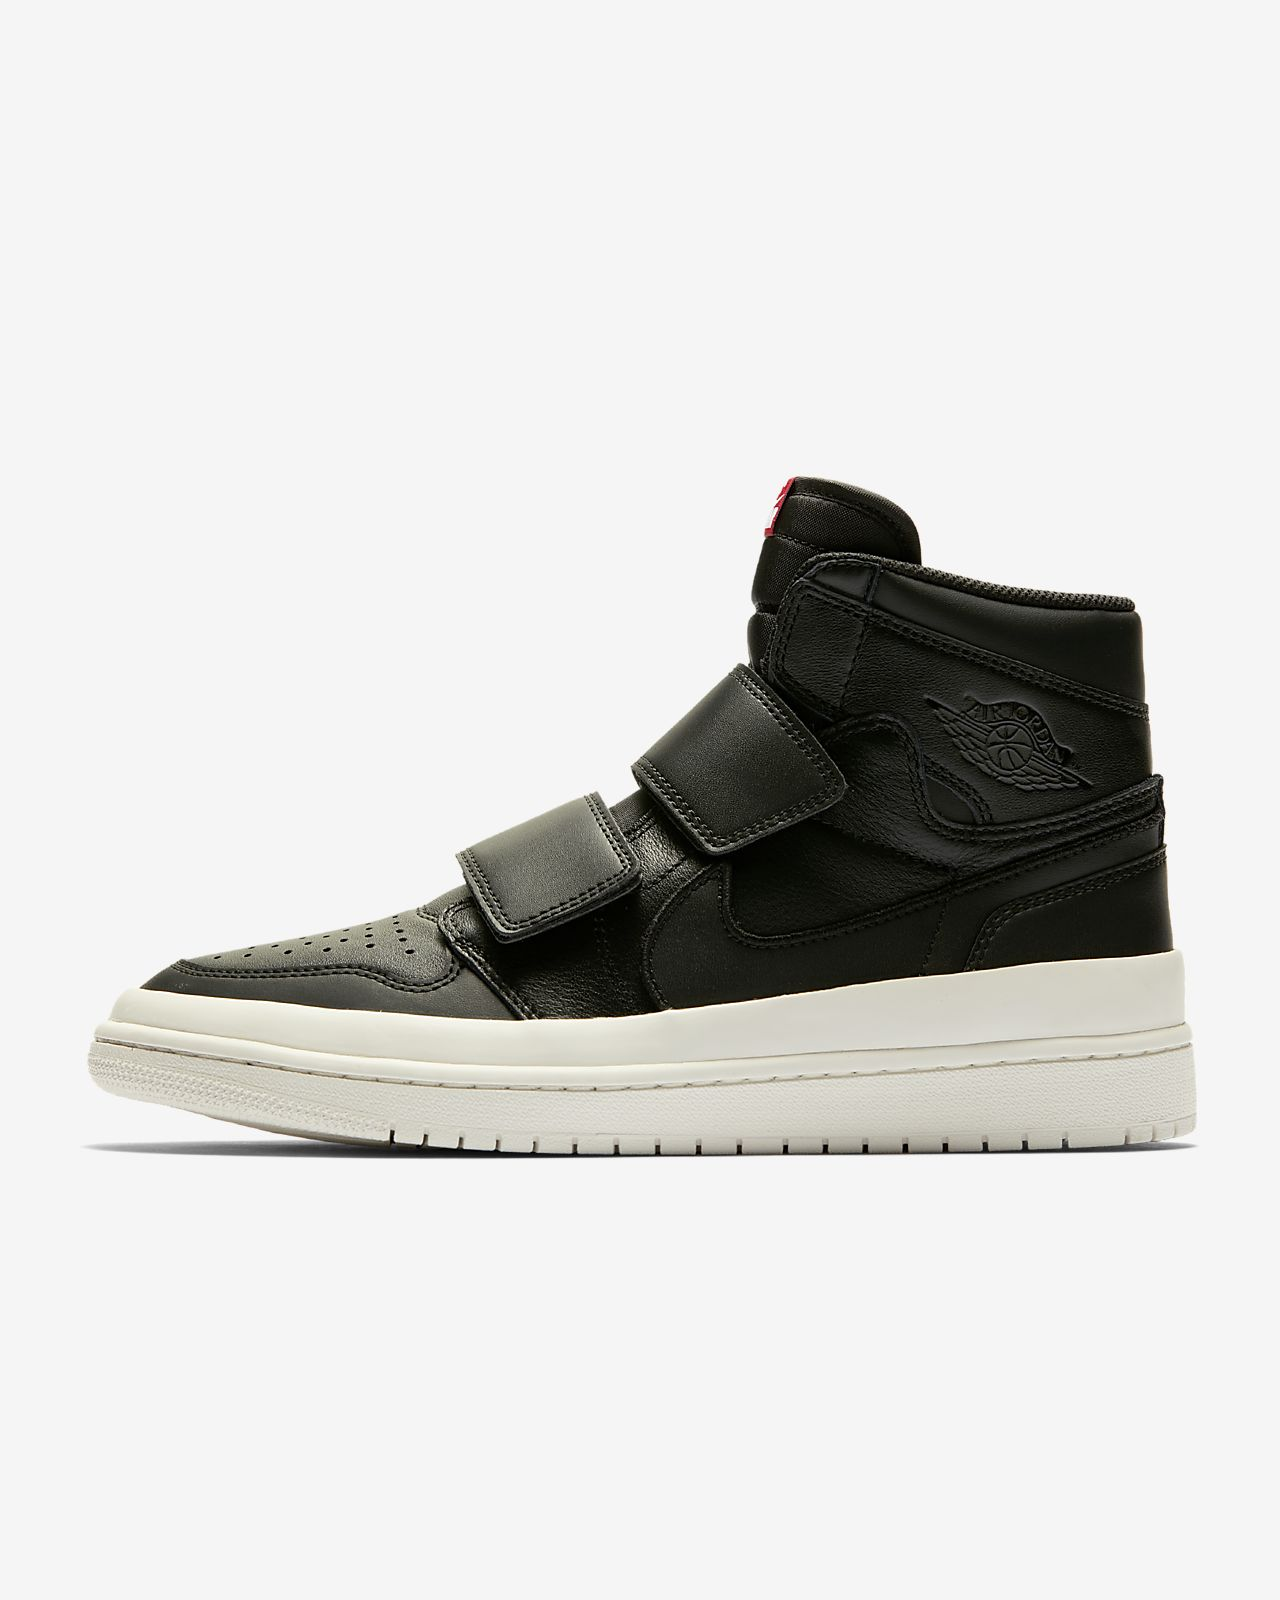 quality design d90fe 9b7b8 ... Chaussure Air Jordan 1 Retro High Double Strap pour Homme